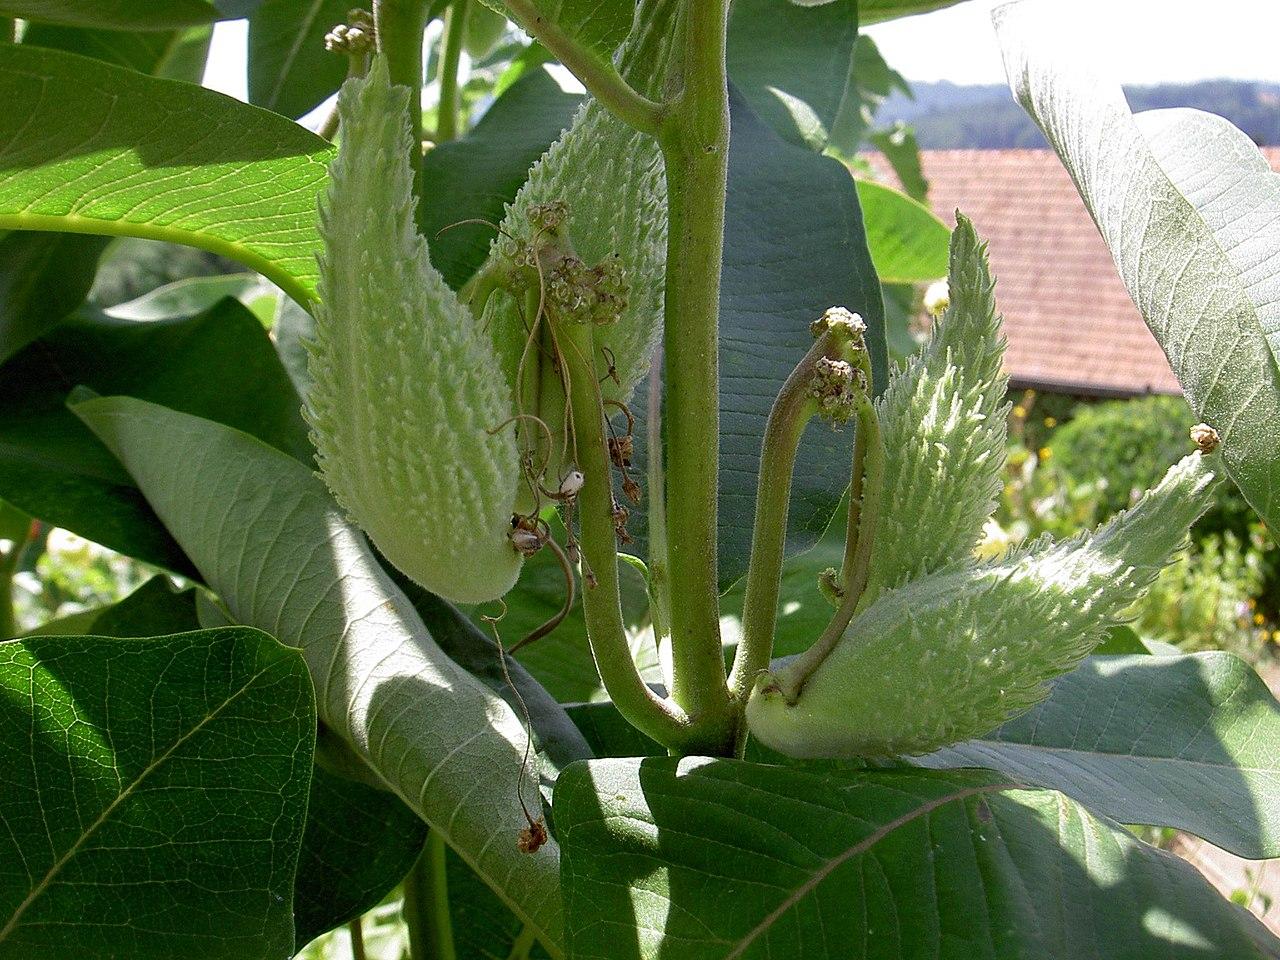 http://upload.wikimedia.org/wikipedia/commons/thumb/2/28/Seidenpflanze-Samenkapsel.jpg/1280px-Seidenpflanze-Samenkapsel.jpg